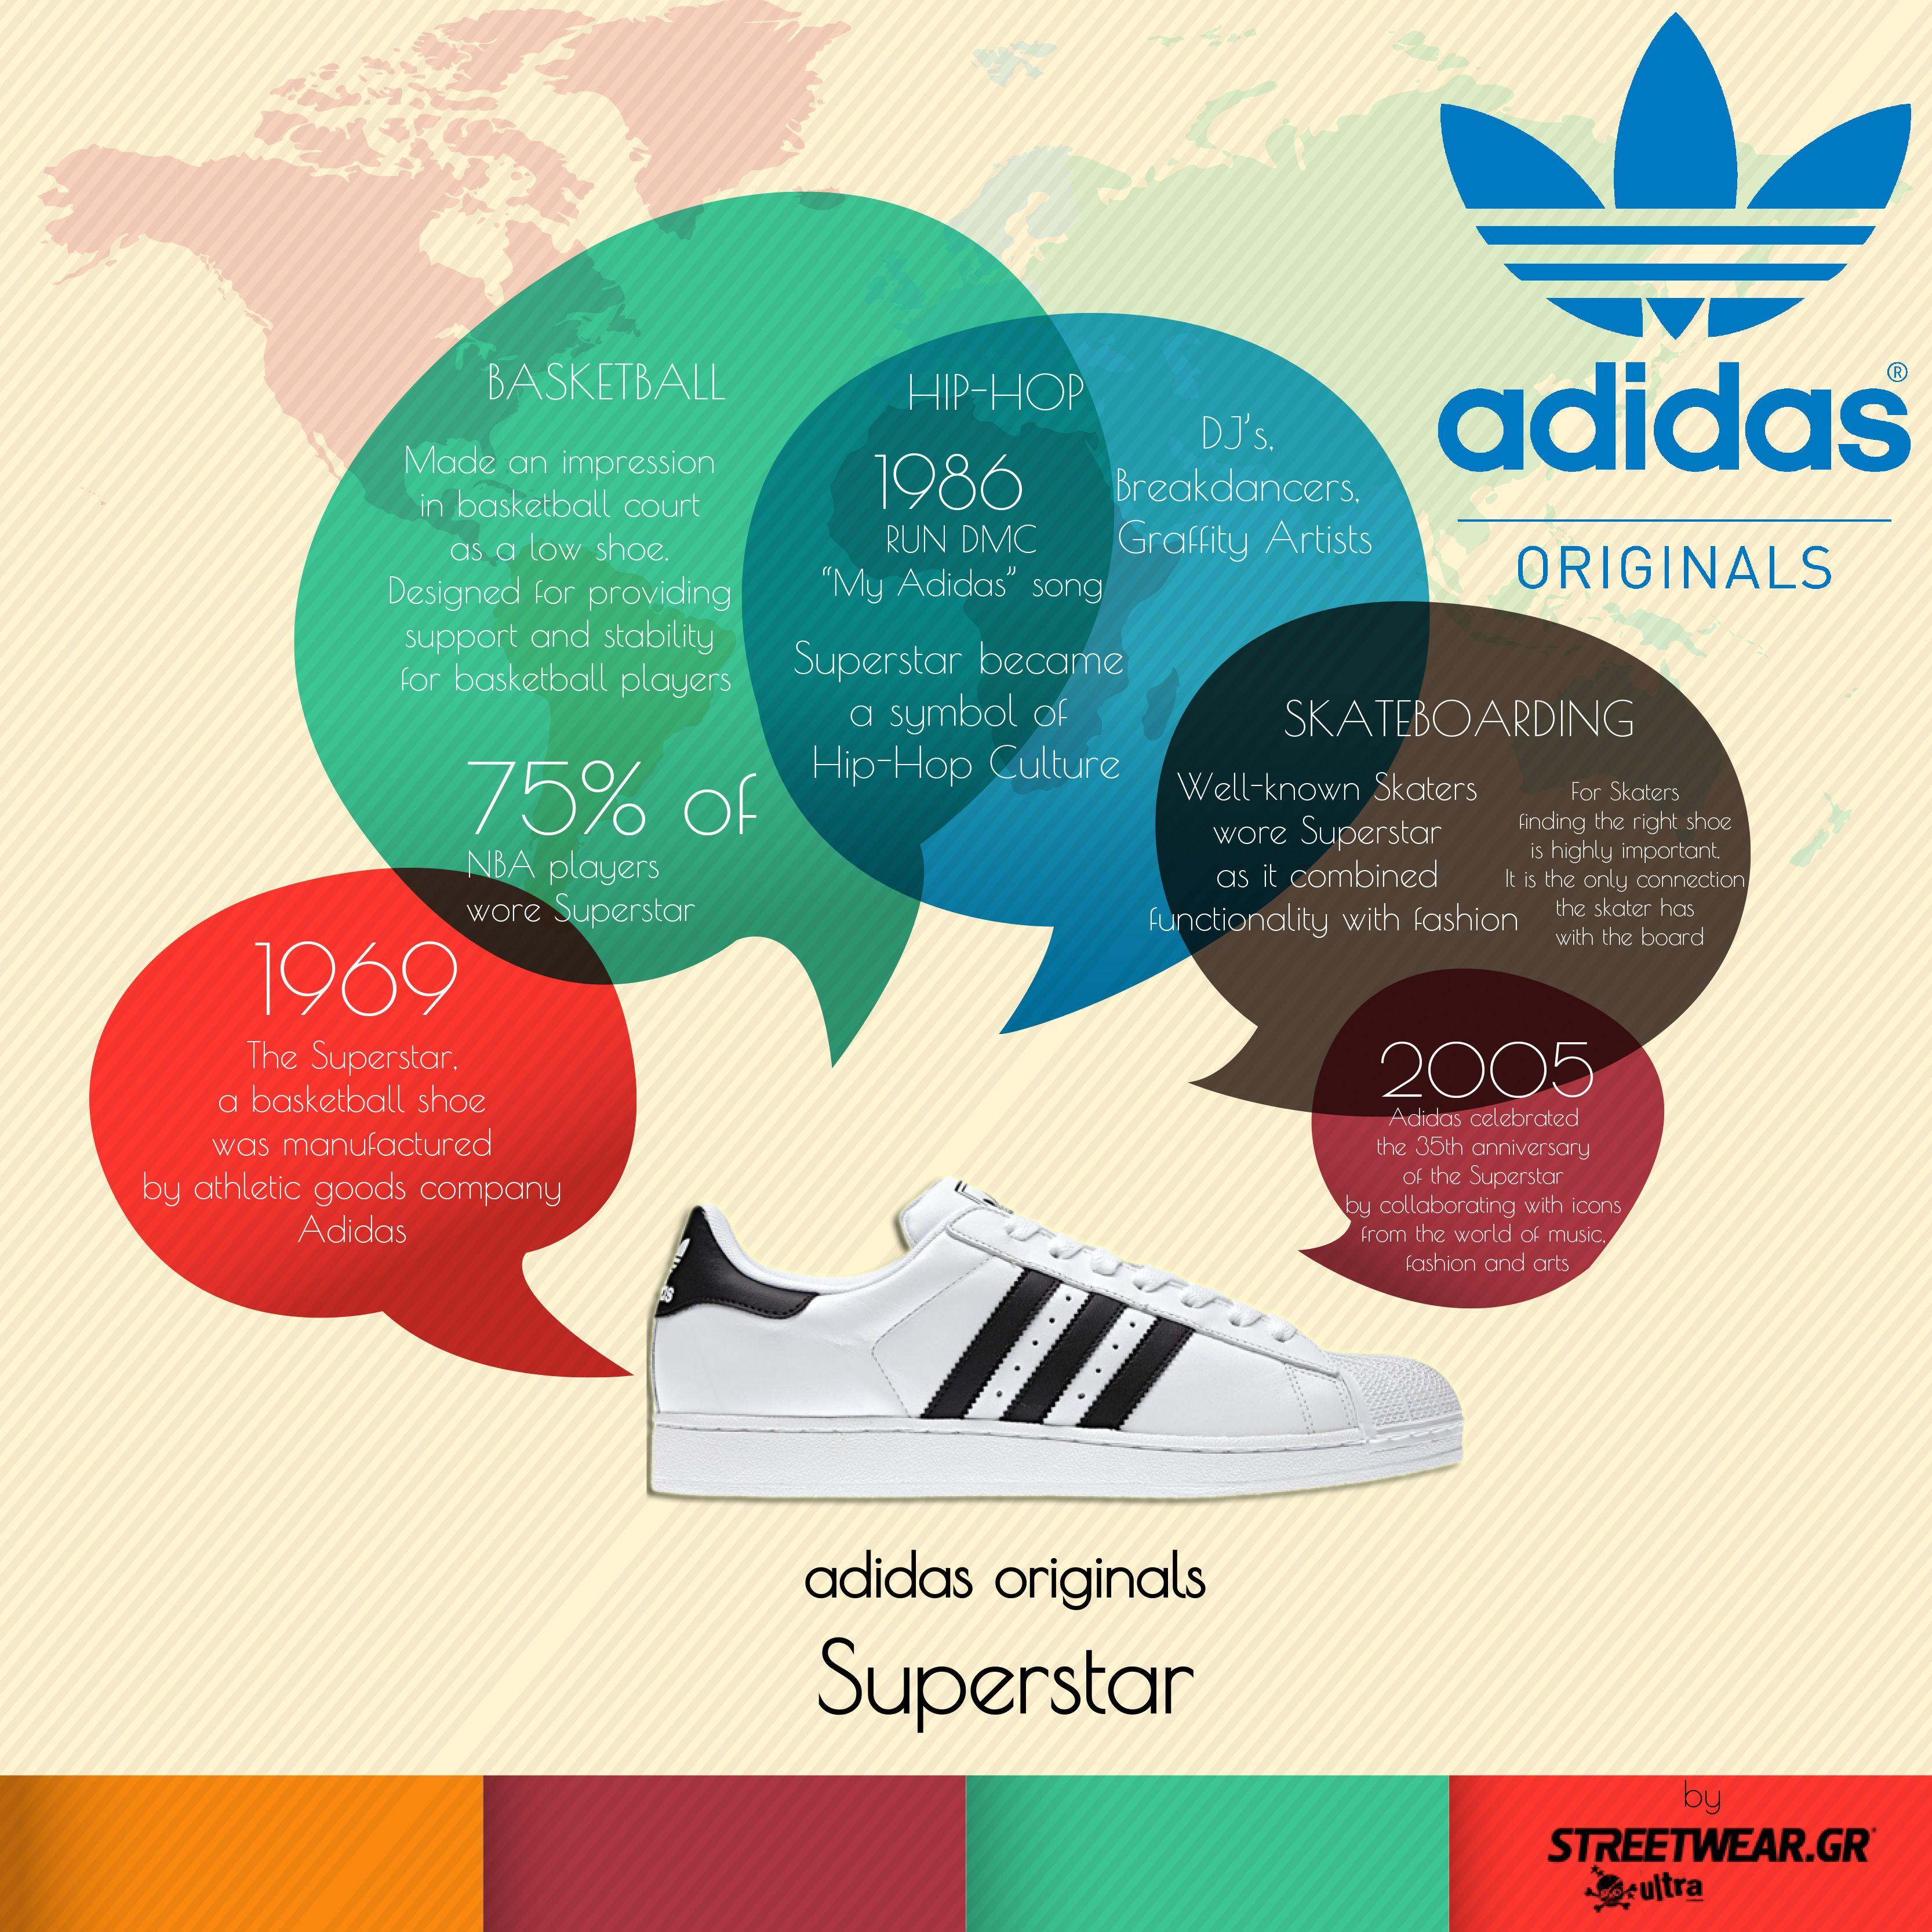 adidas originals superstar infographic